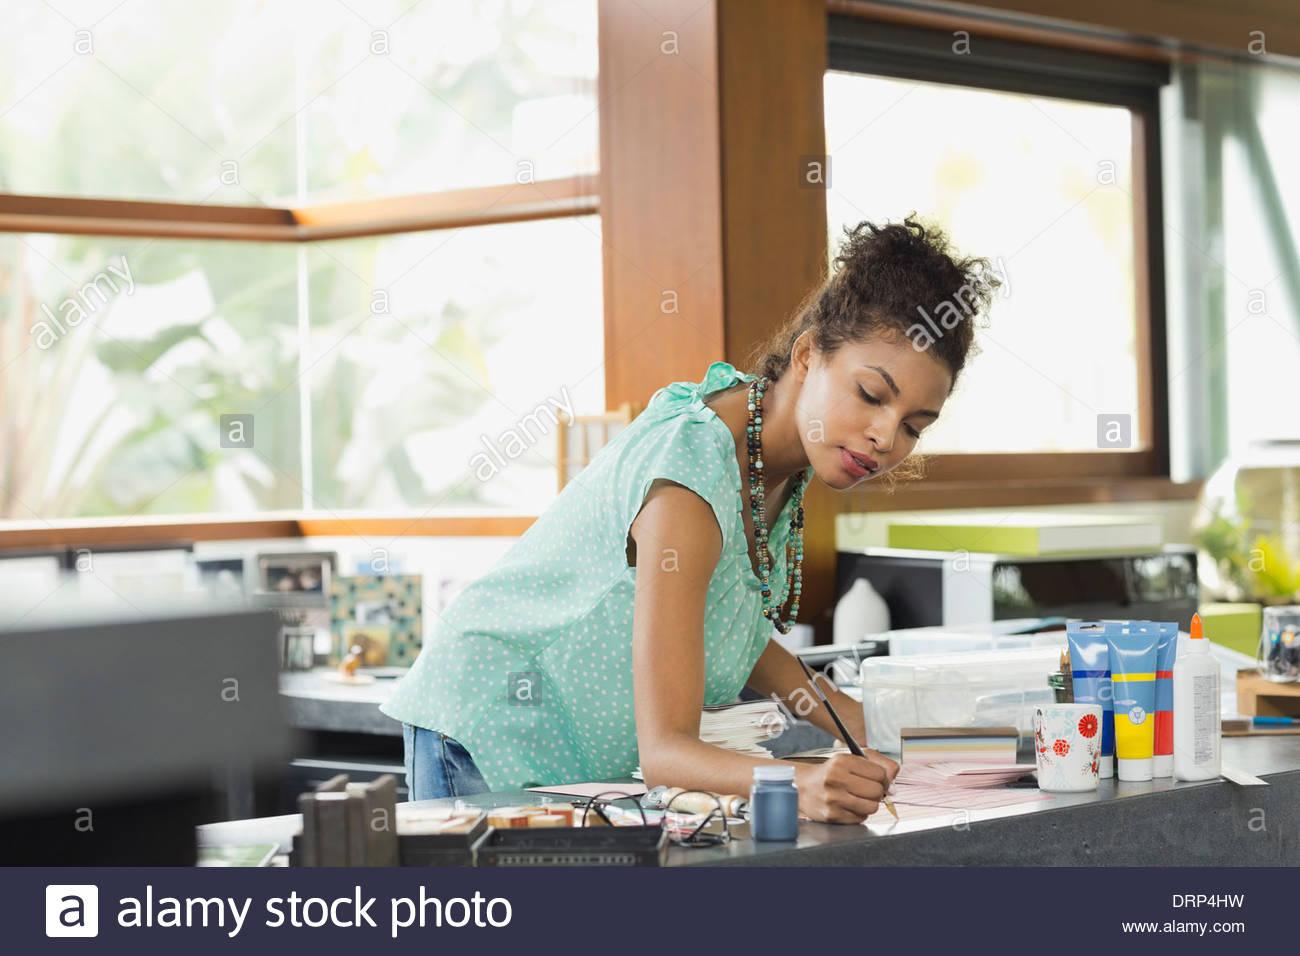 Stationary designer working in studio - Stock Image